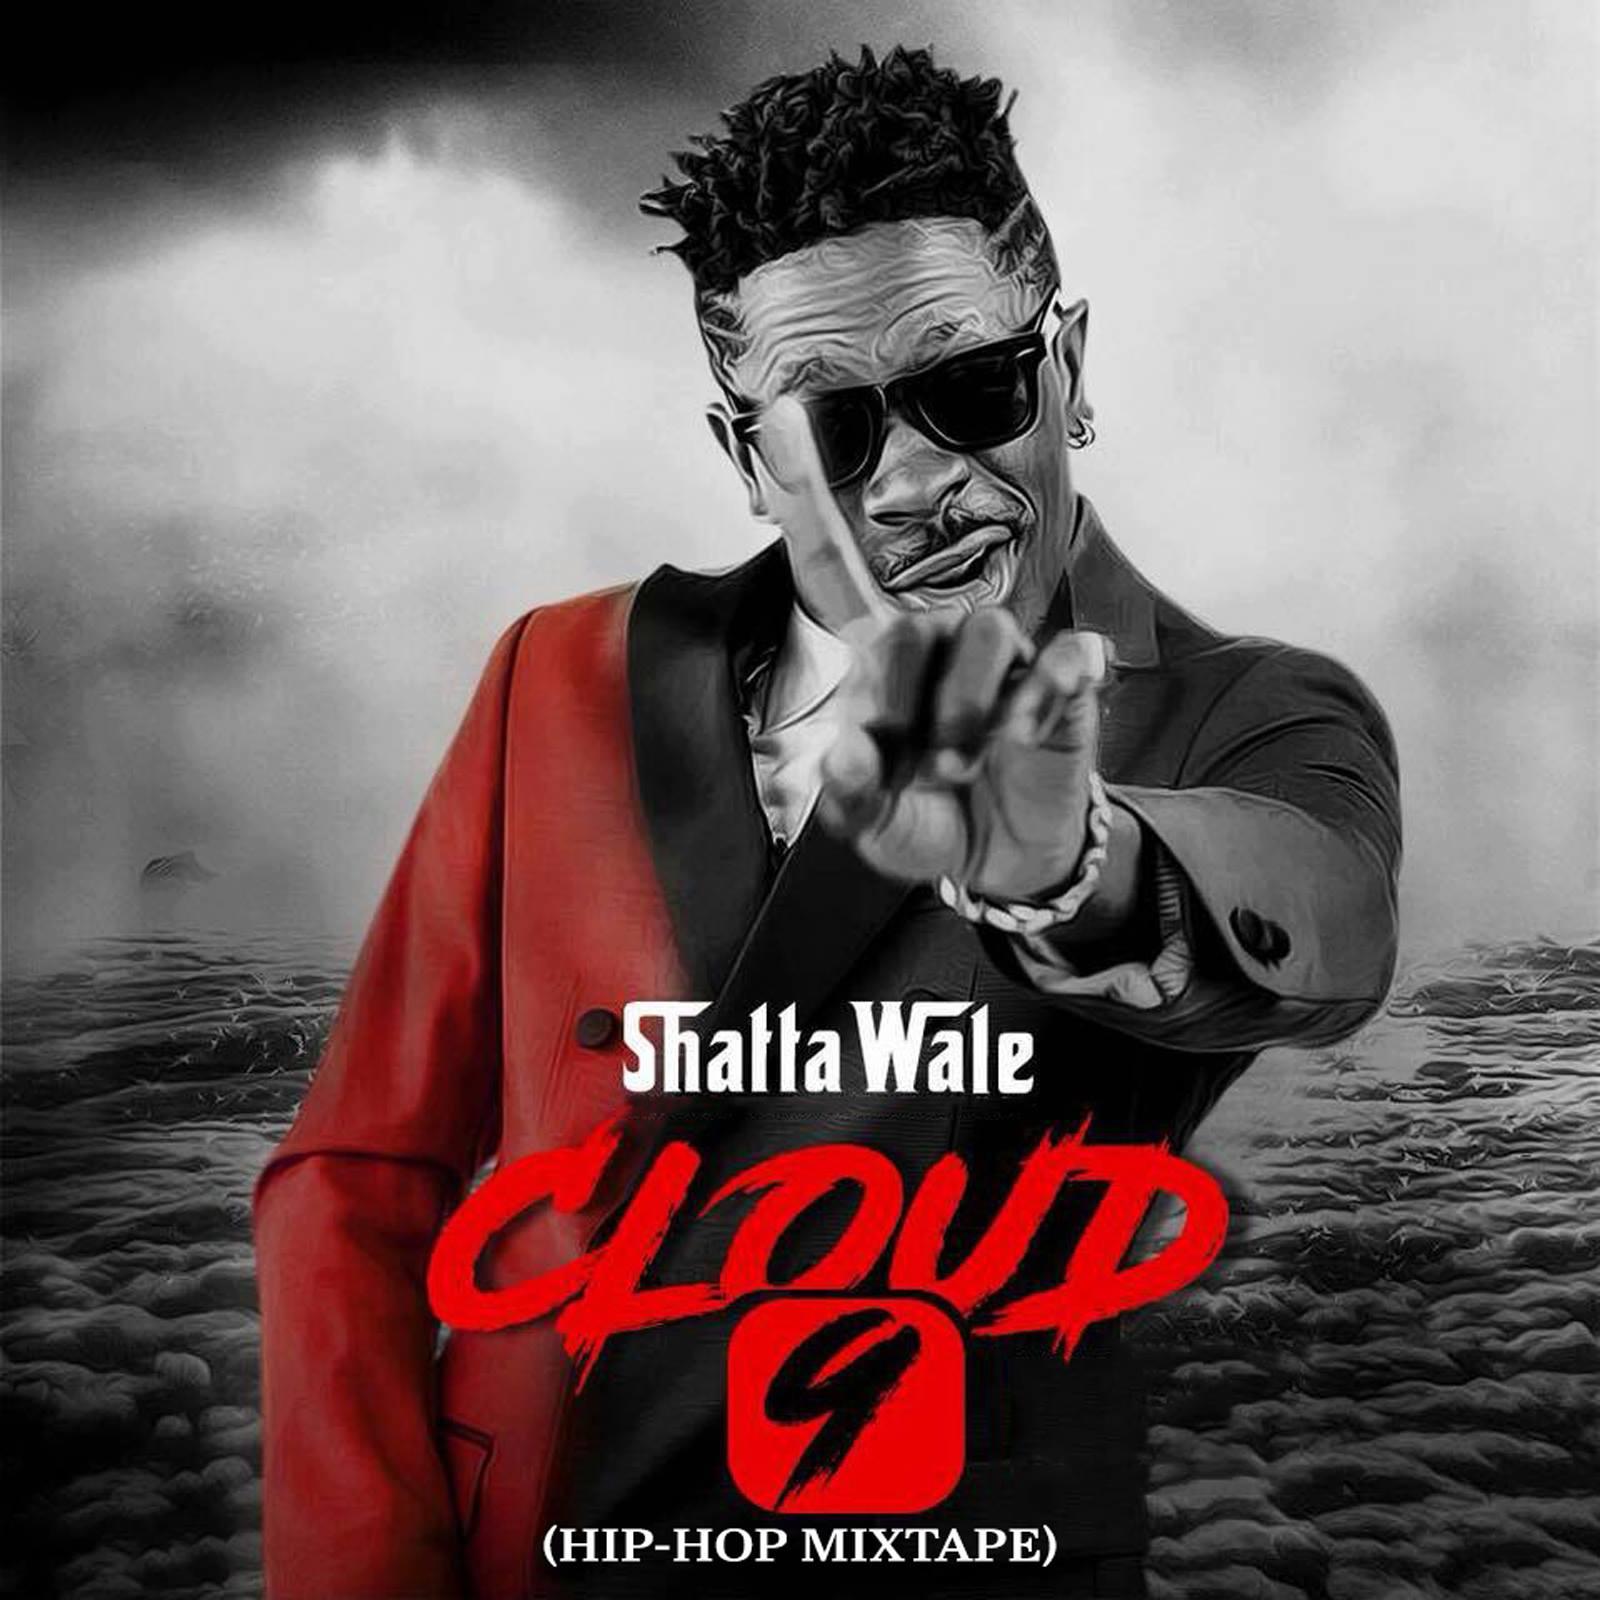 Cloud 9 (Hiphop Mixtape) by Shatta Wale